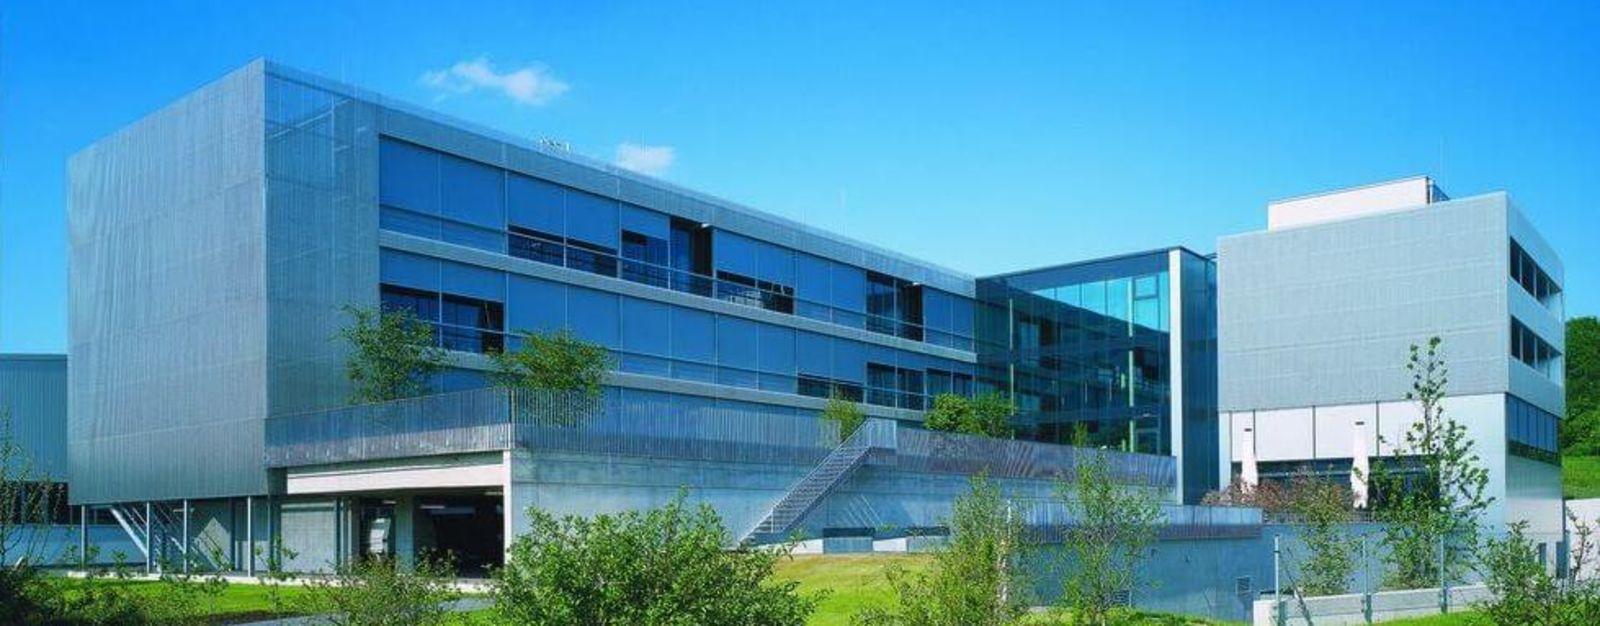 Peneder Bau GmbH